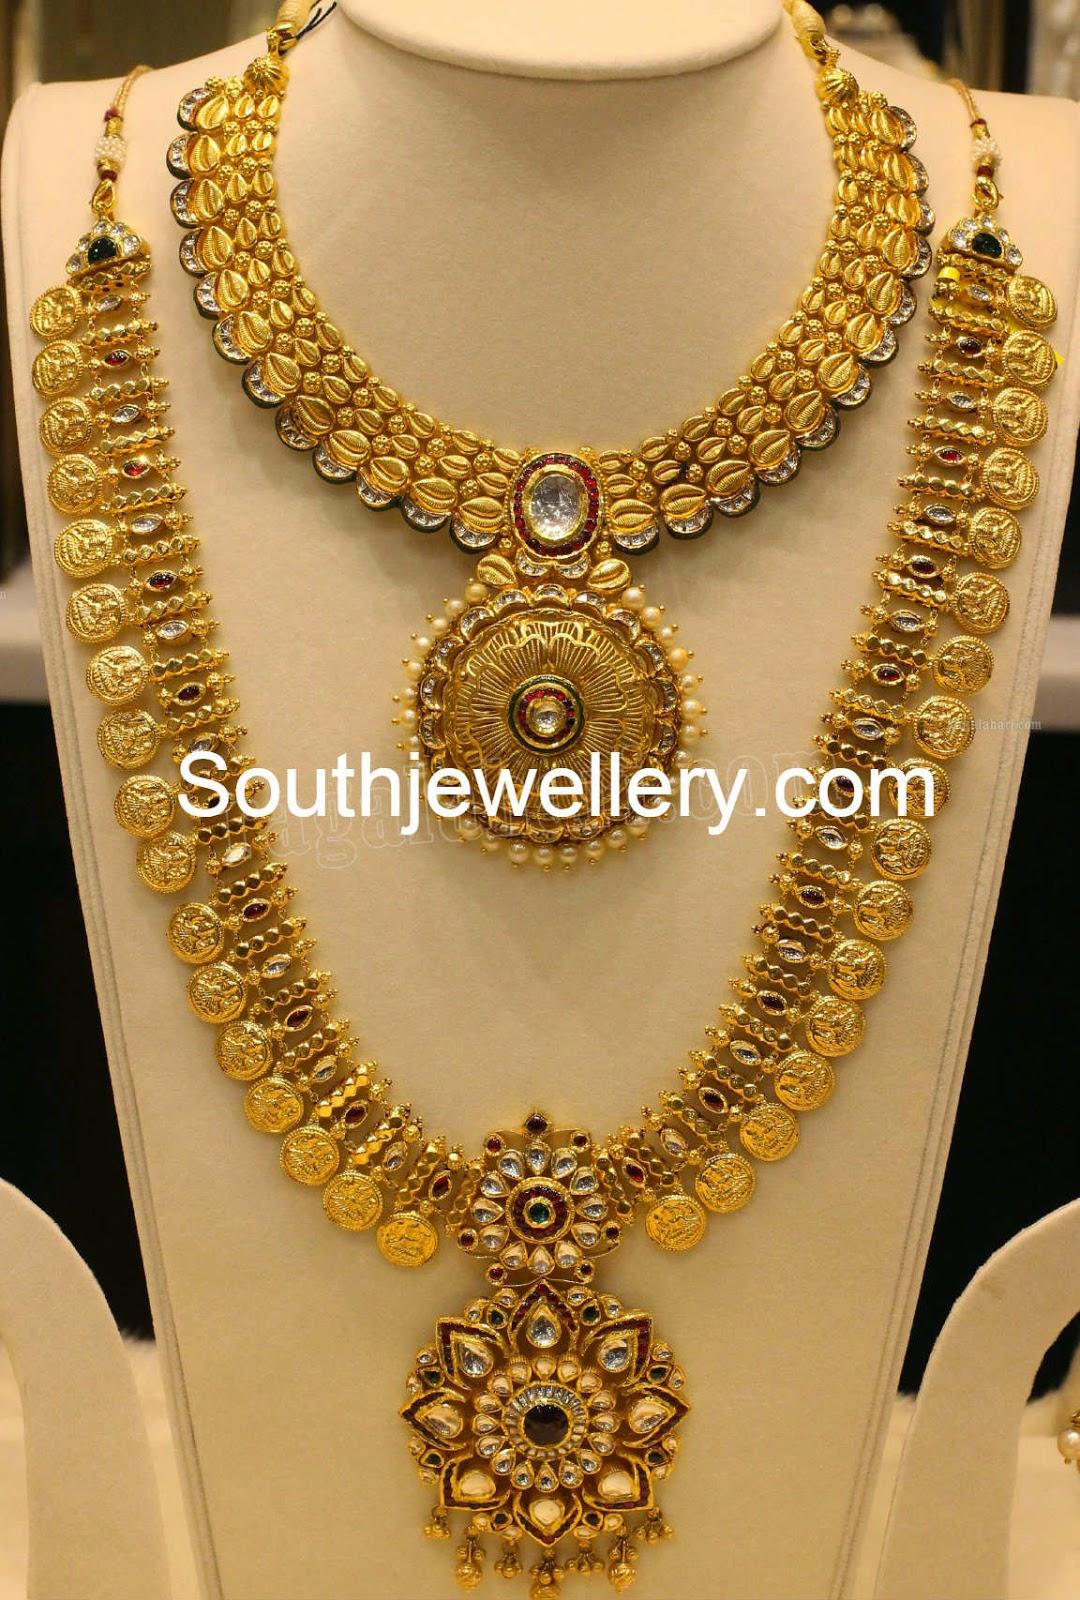 Suhasini in gundla haram jewellery designs - Lakshmi Kasu Haram